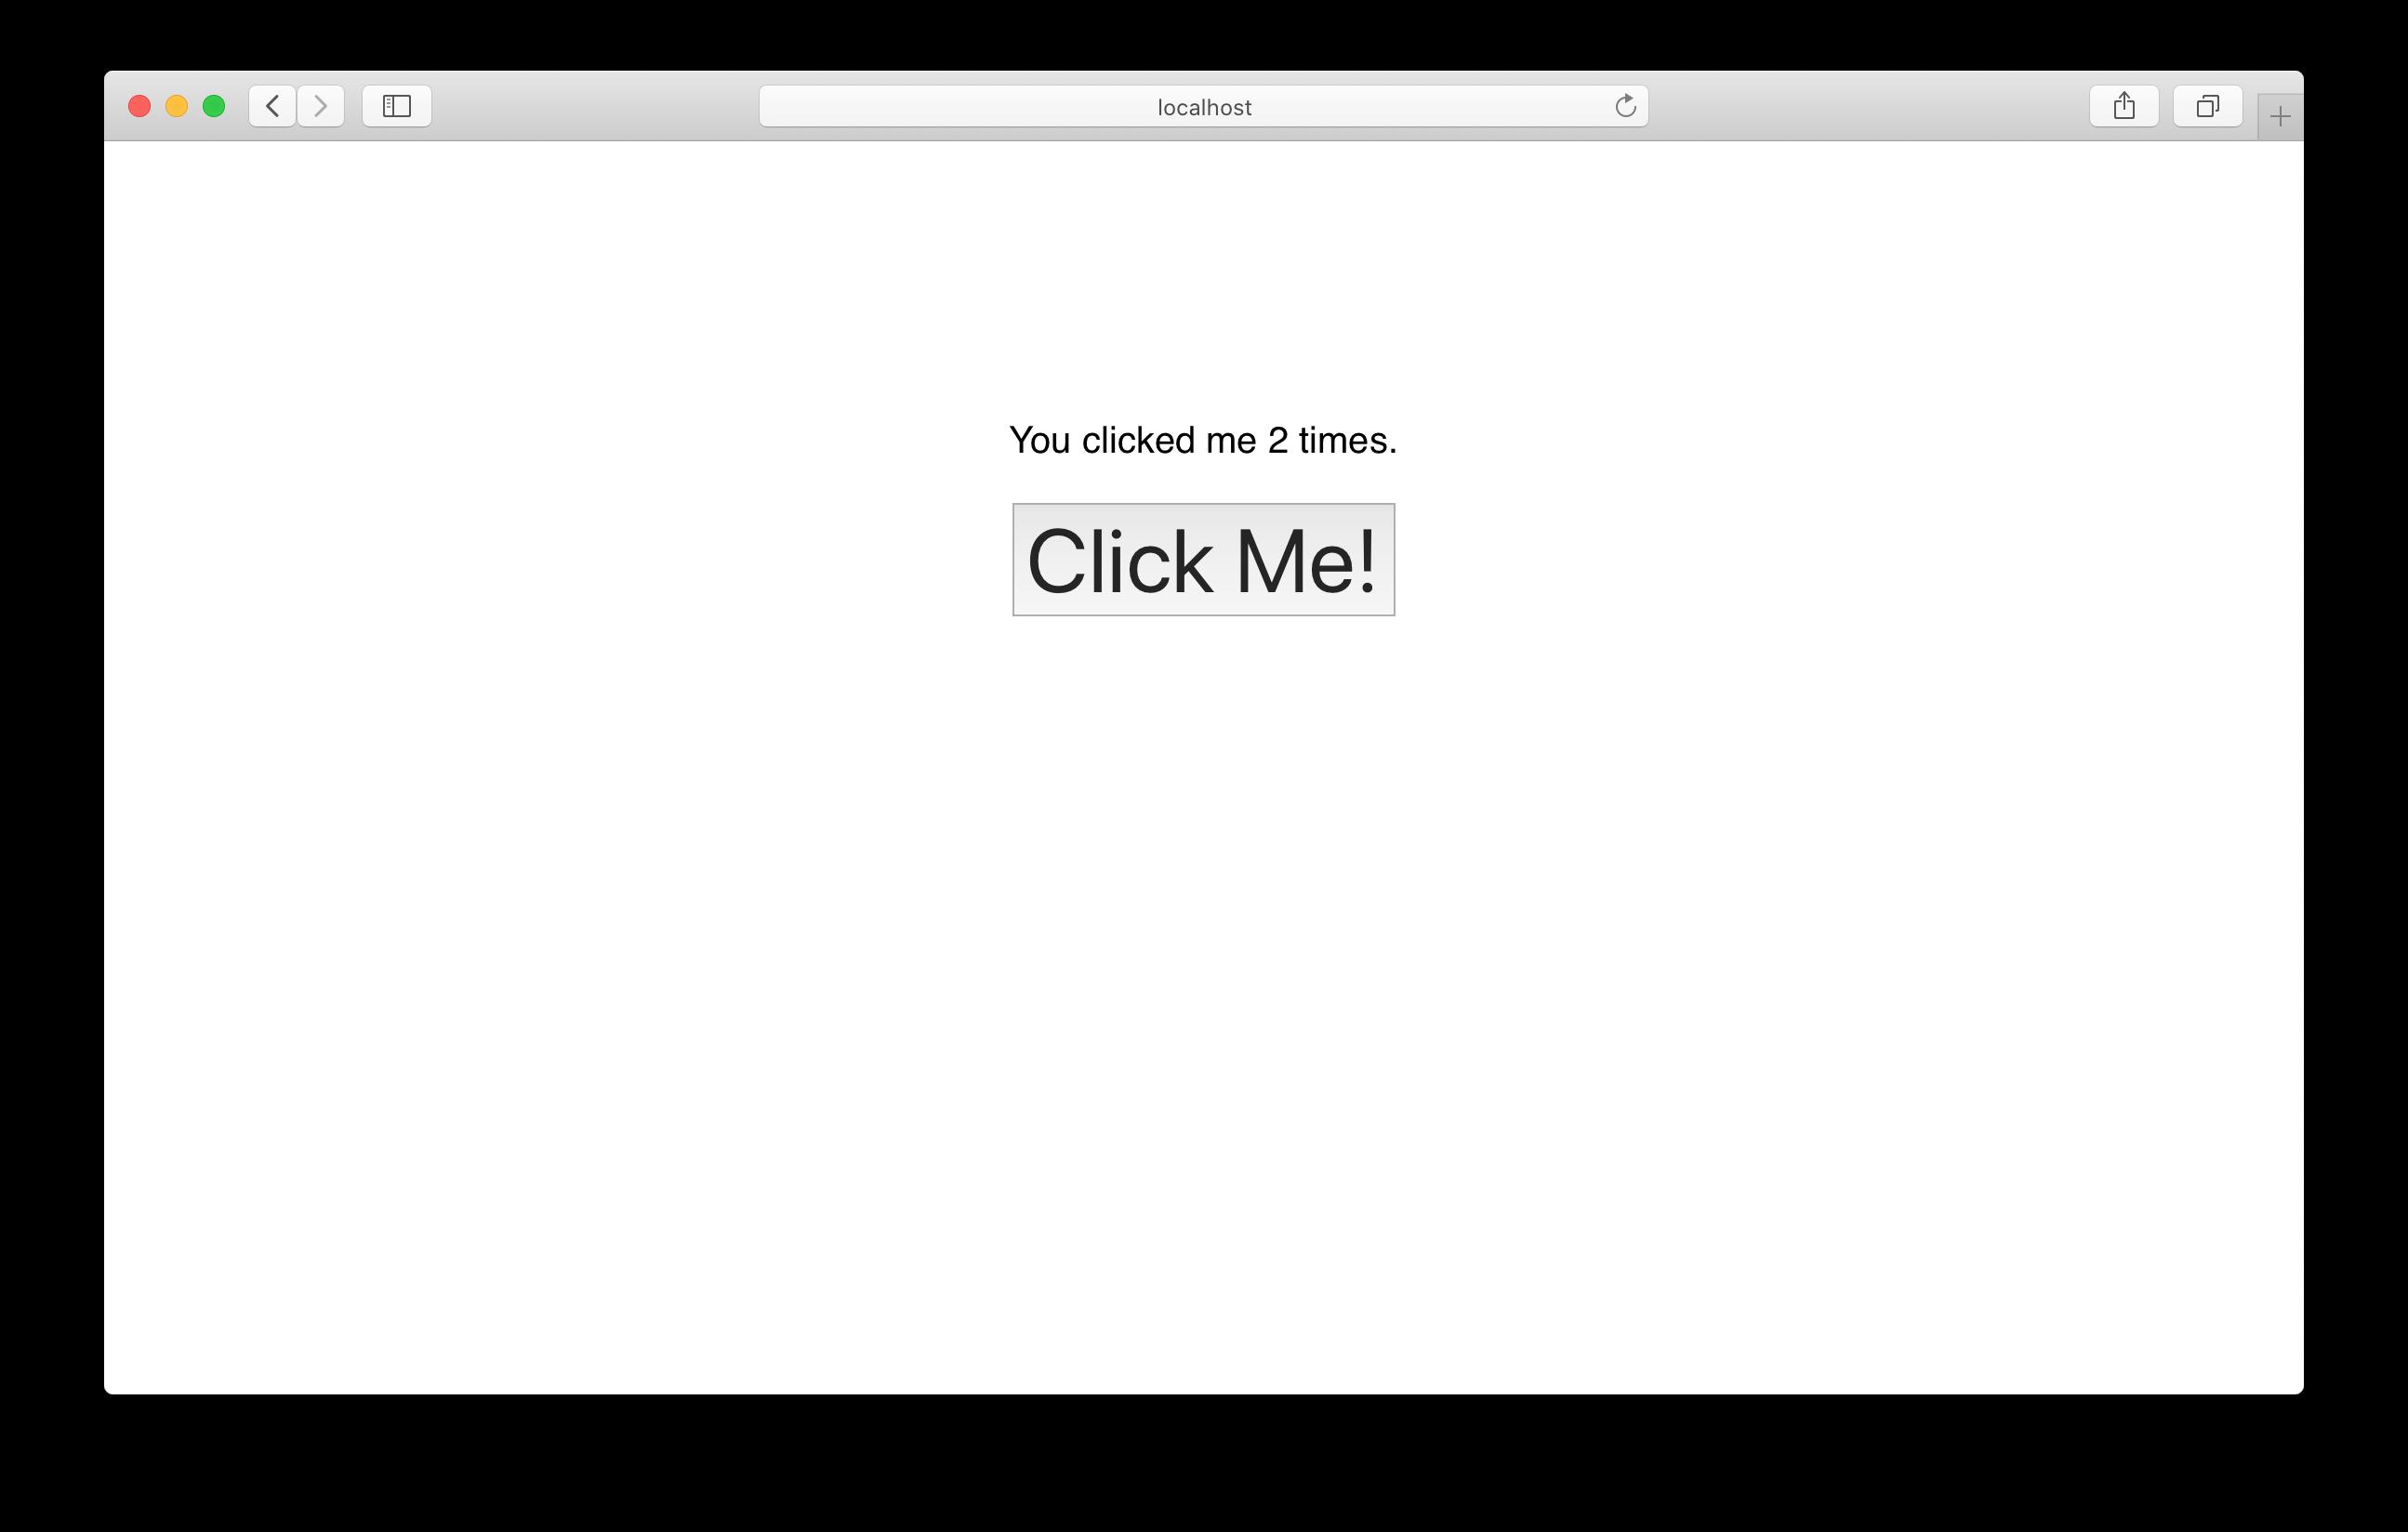 Click counter UI in Next.js app